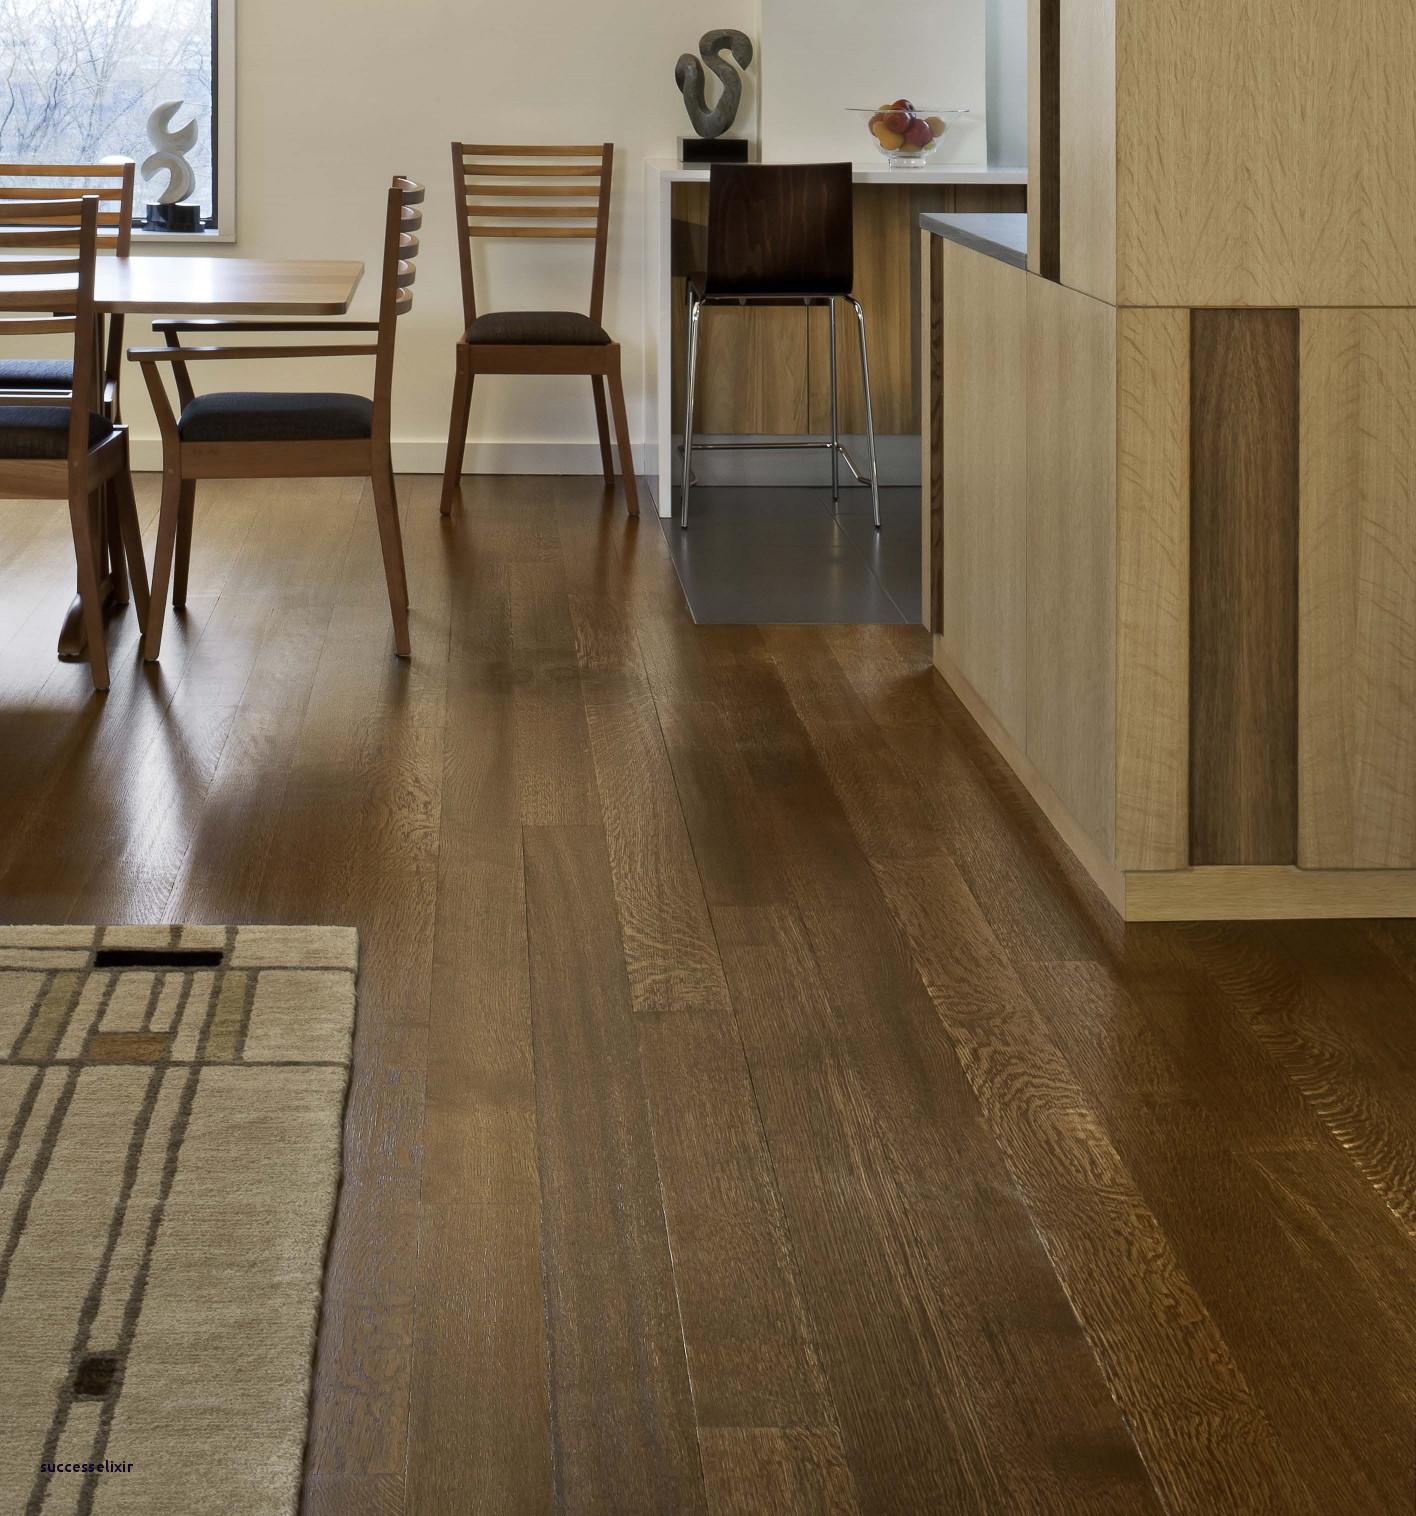 bamboo vs engineered hardwood flooring of bamboo laminate flooring inspirational breathtaking discount with bamboo laminate flooring inspirational breathtaking discount hardwood flooring 7 how do you clean